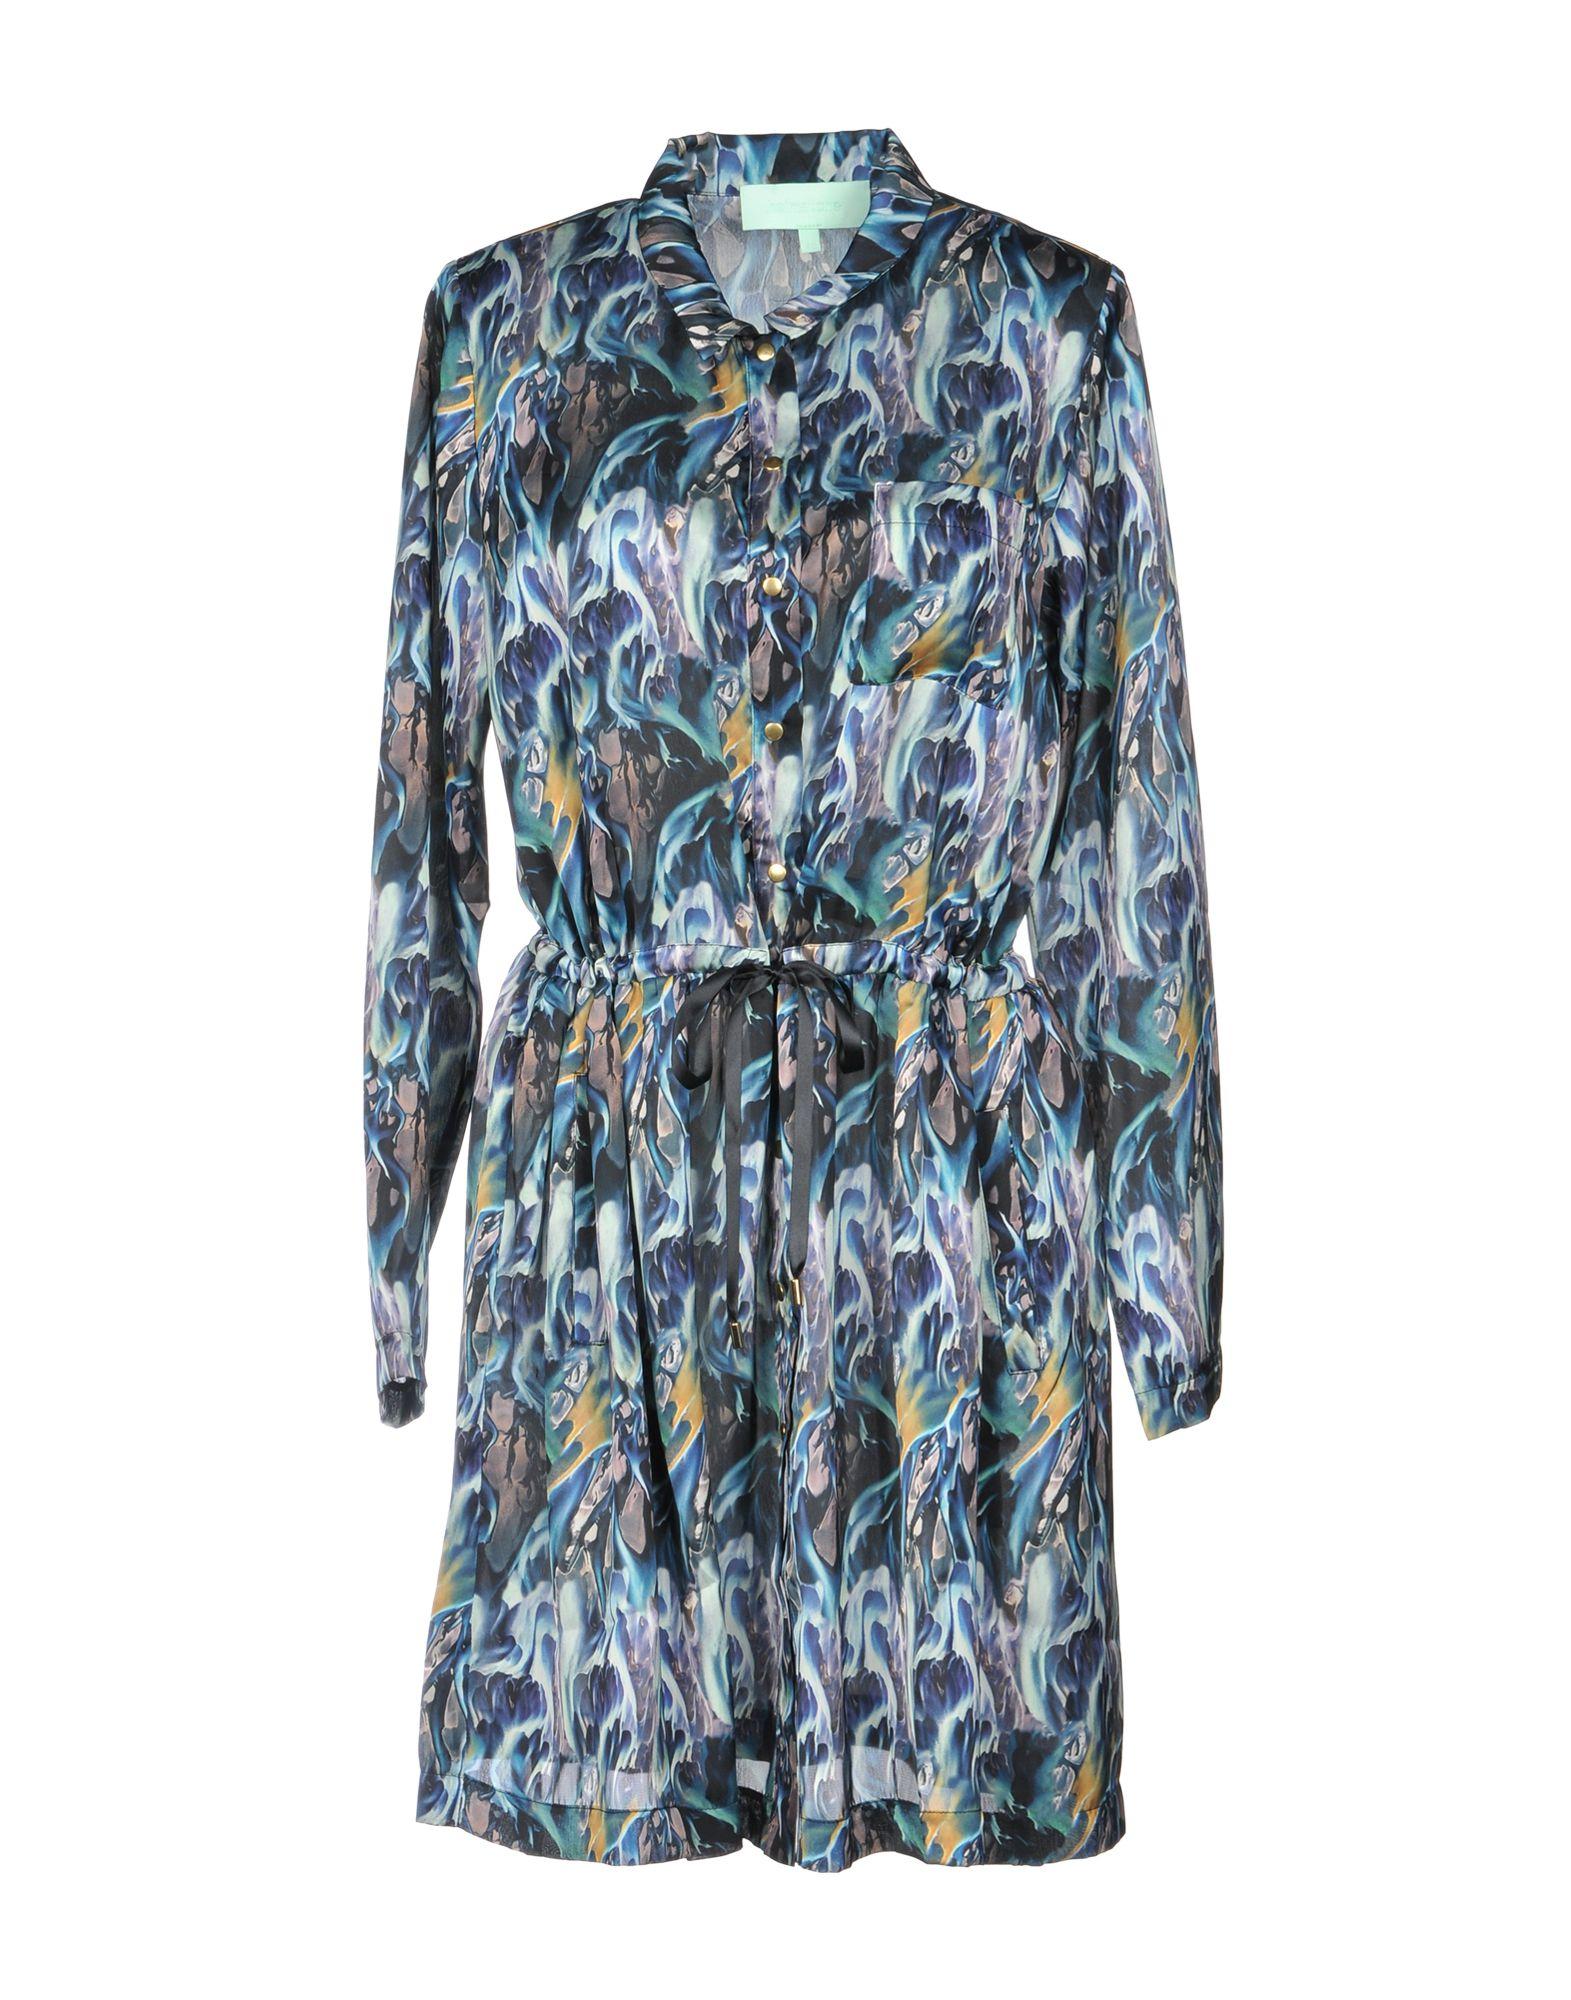 HEIMSTONE Короткое платье платье рубашка fox yulia sway платье рубашка fox